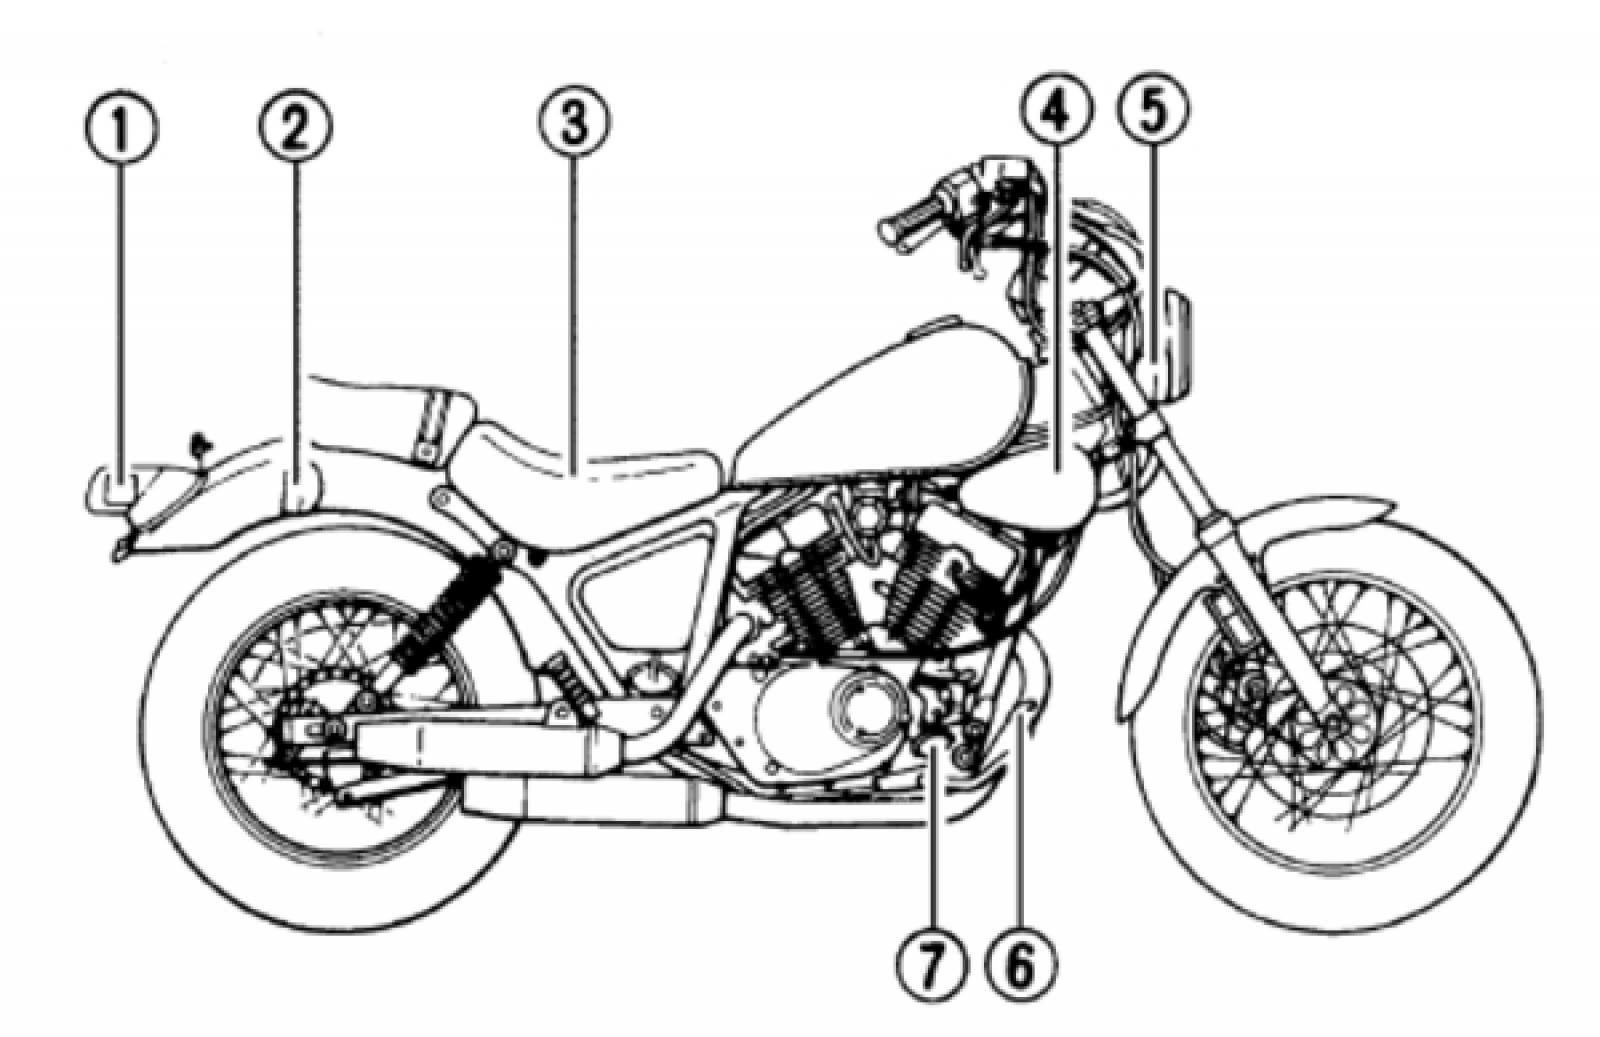 virago 250 wiring diagram 1999 ford super duty radio of yamaha motorcycle parts 2004 xv250s fuel tank mnl 1178 1996 manual 2019 ebook library